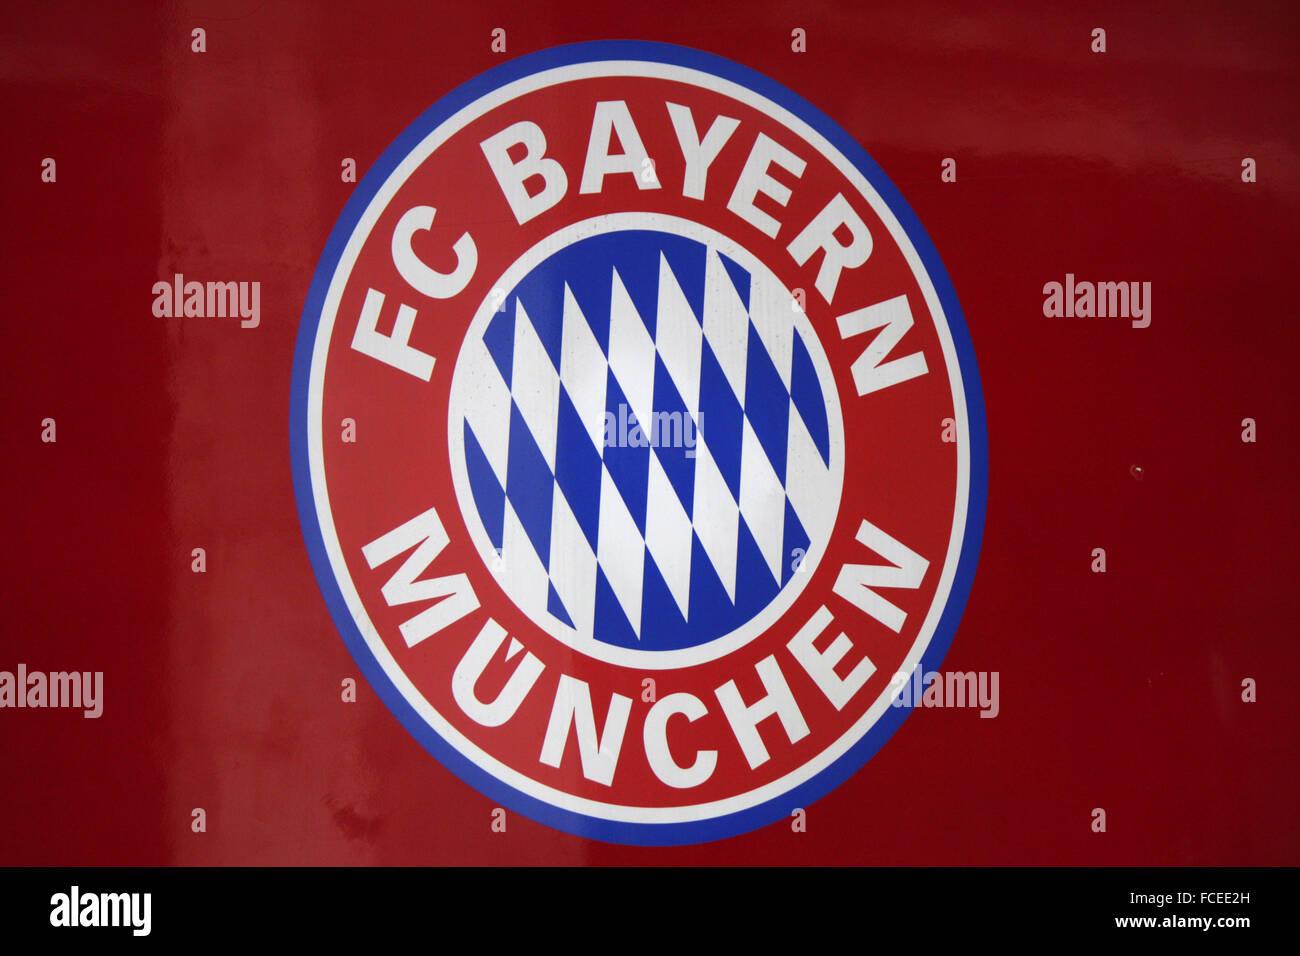 Markenname: 'FC Bayern Muenchen', Berlin. - Stock Image